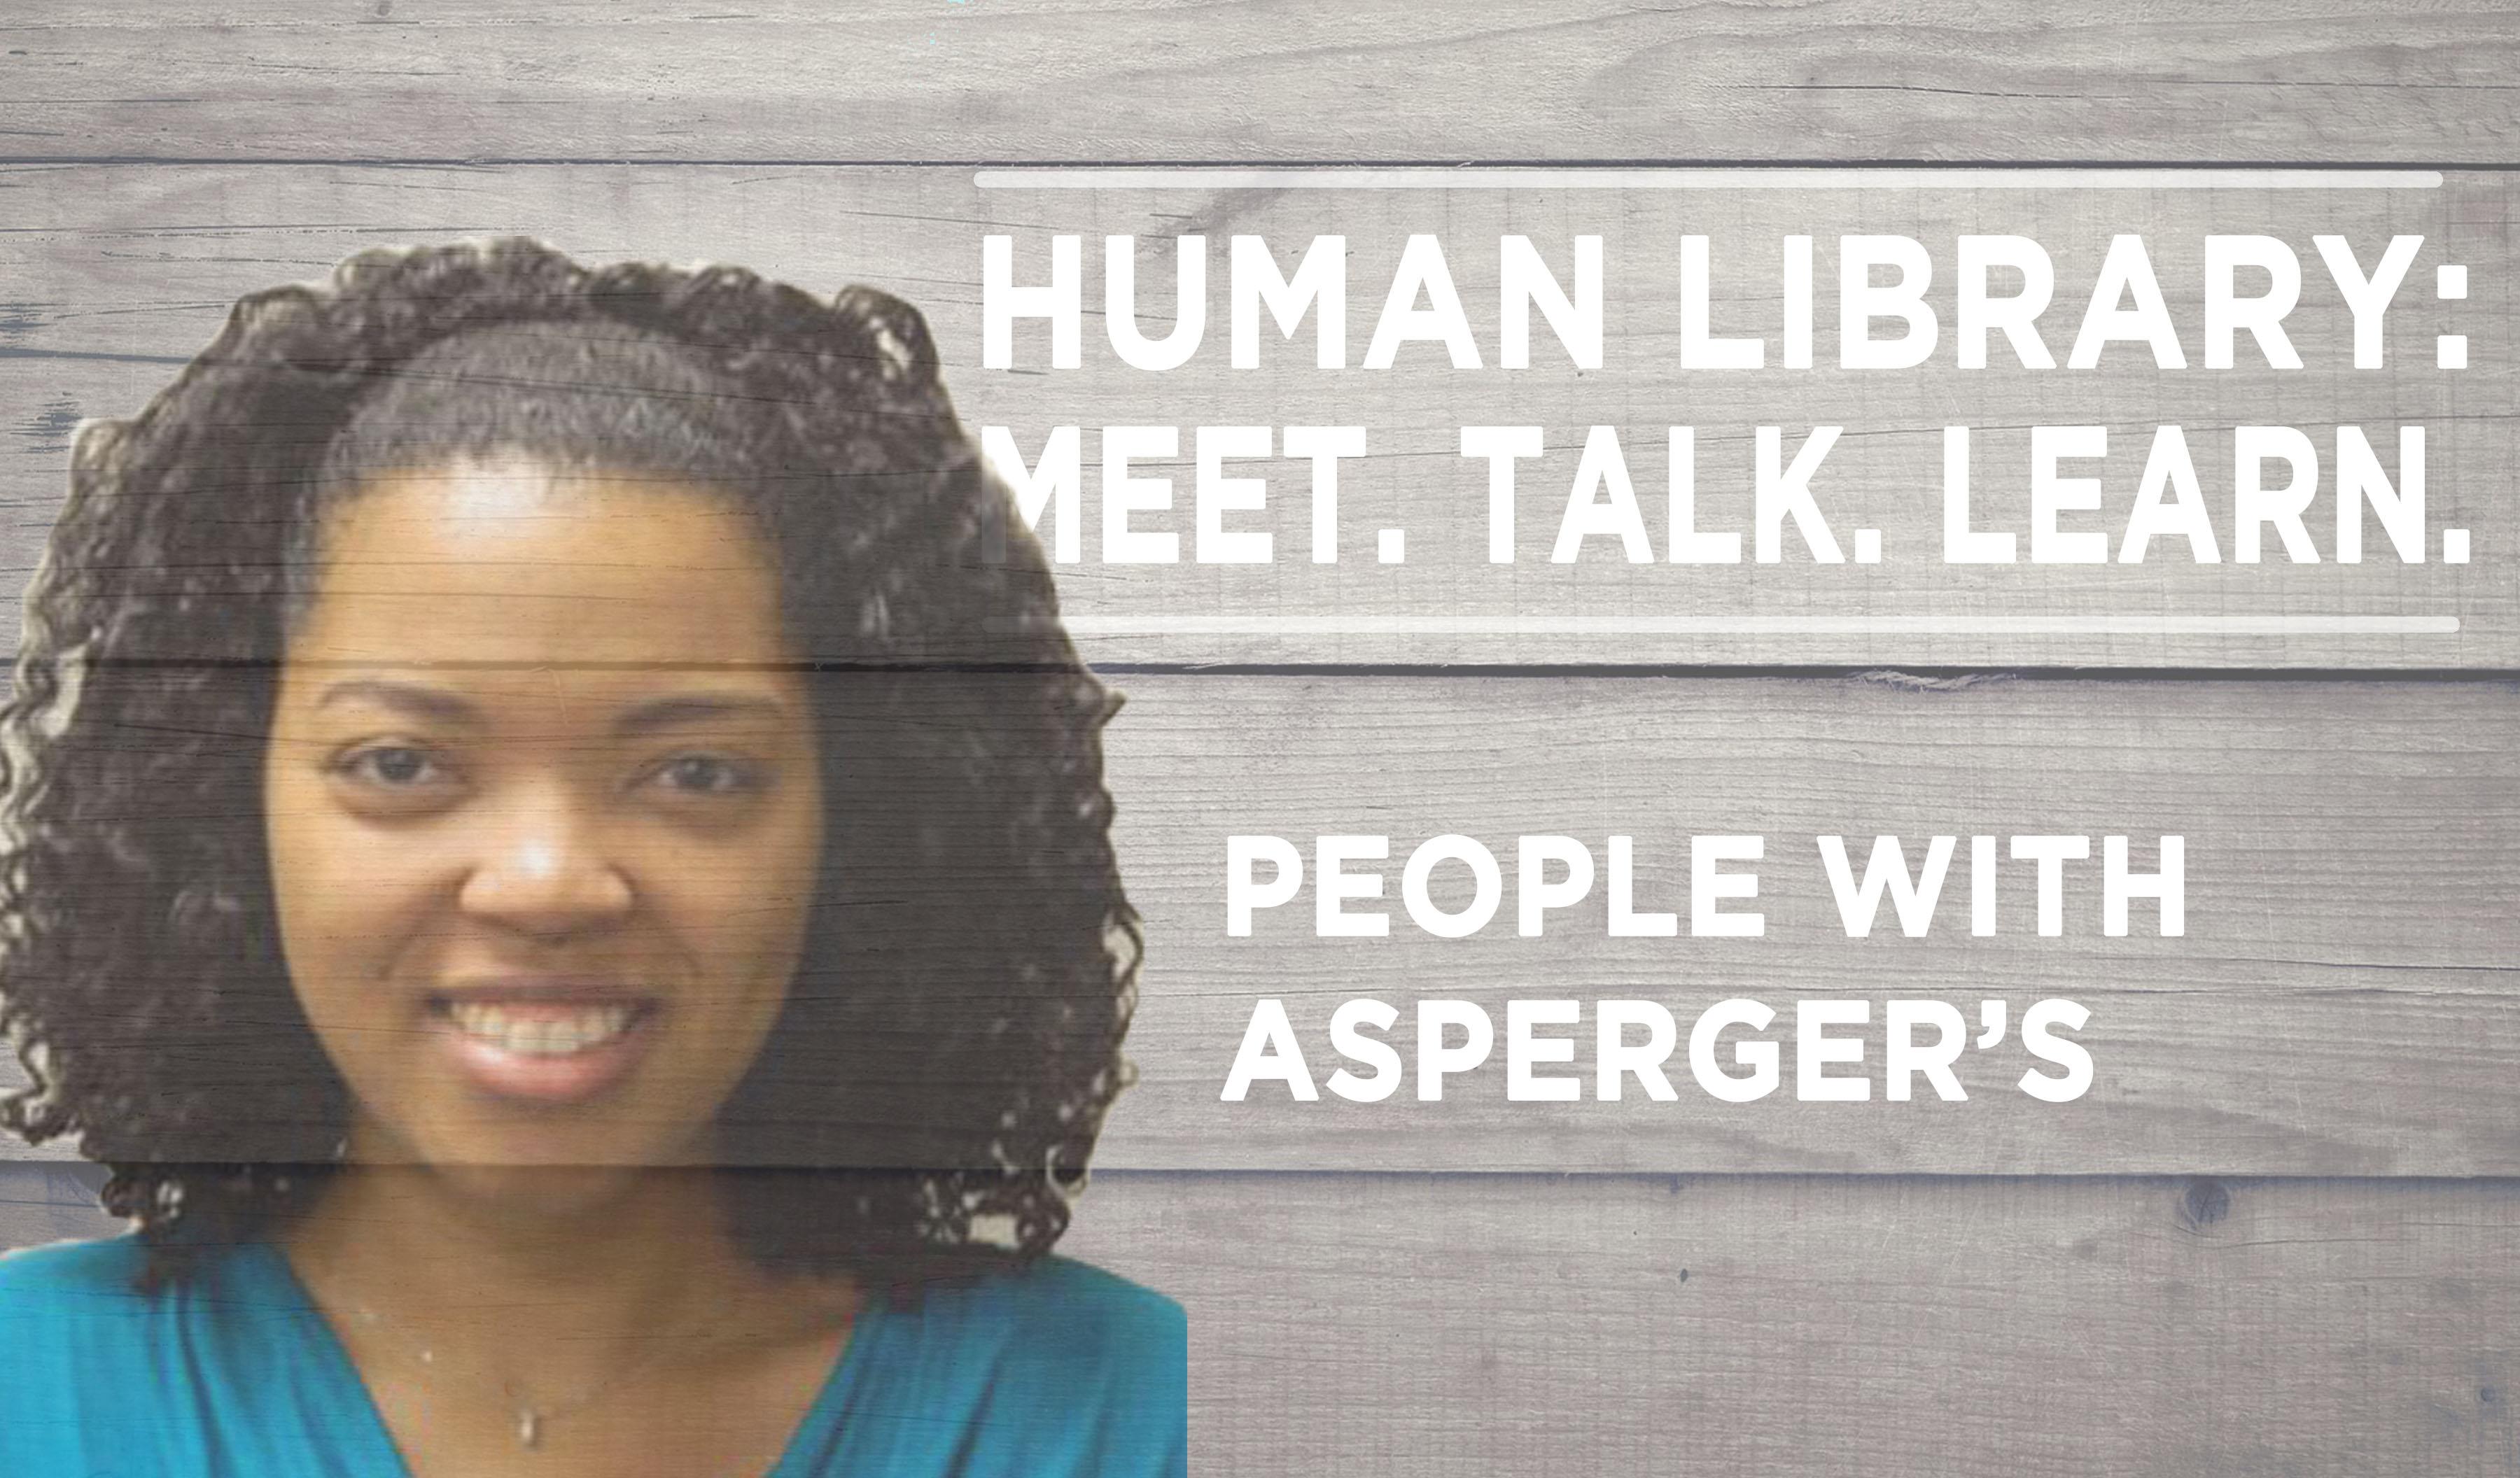 Human Library Logo2 - Asperger's